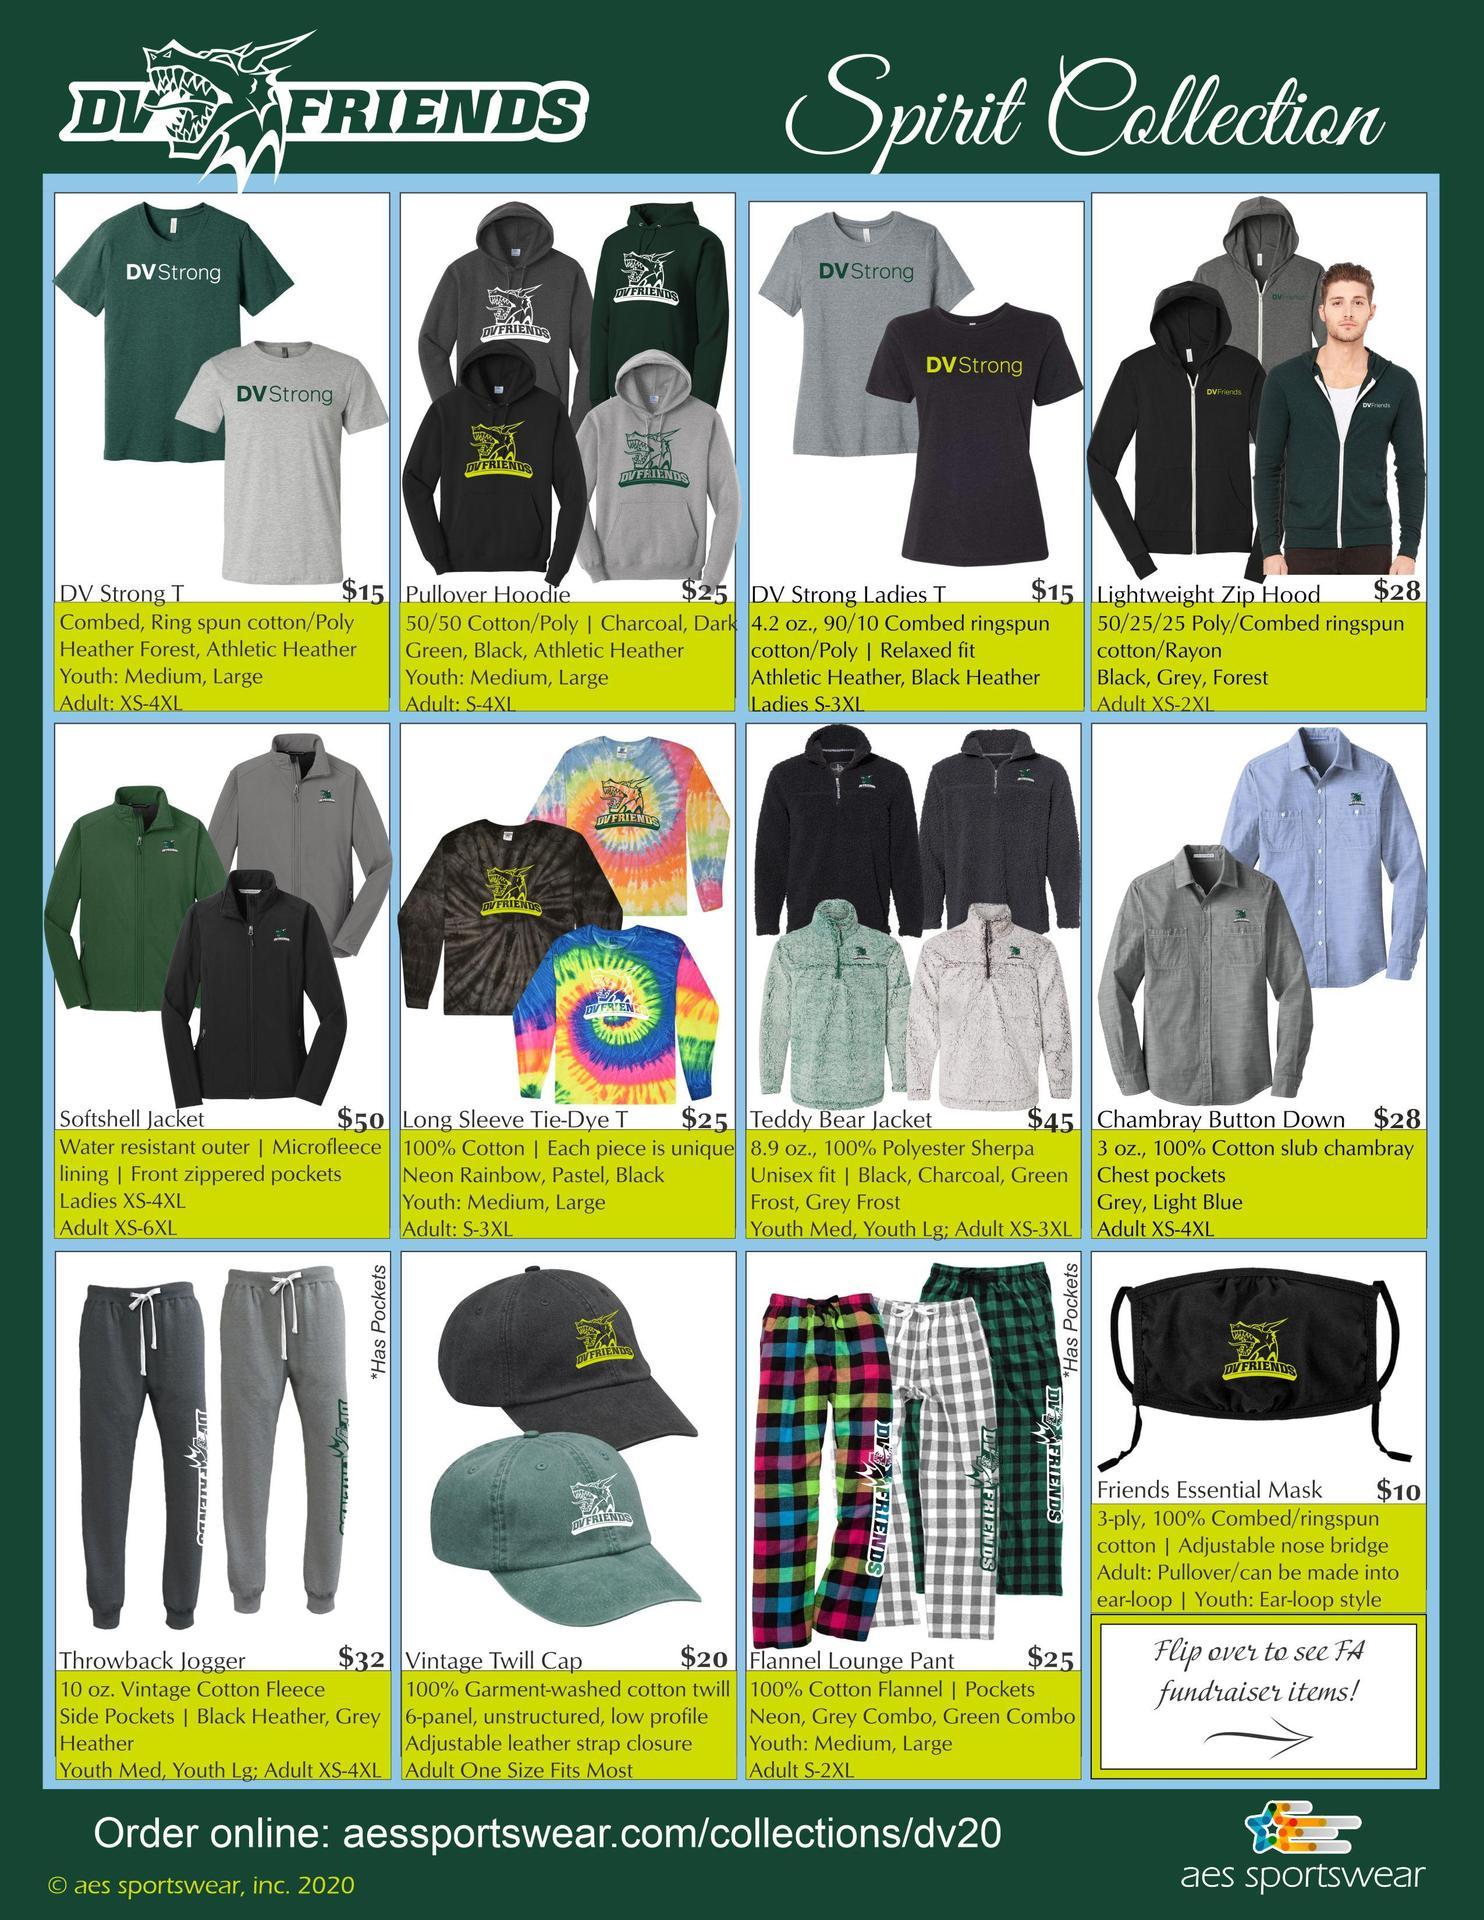 General spiritwear items